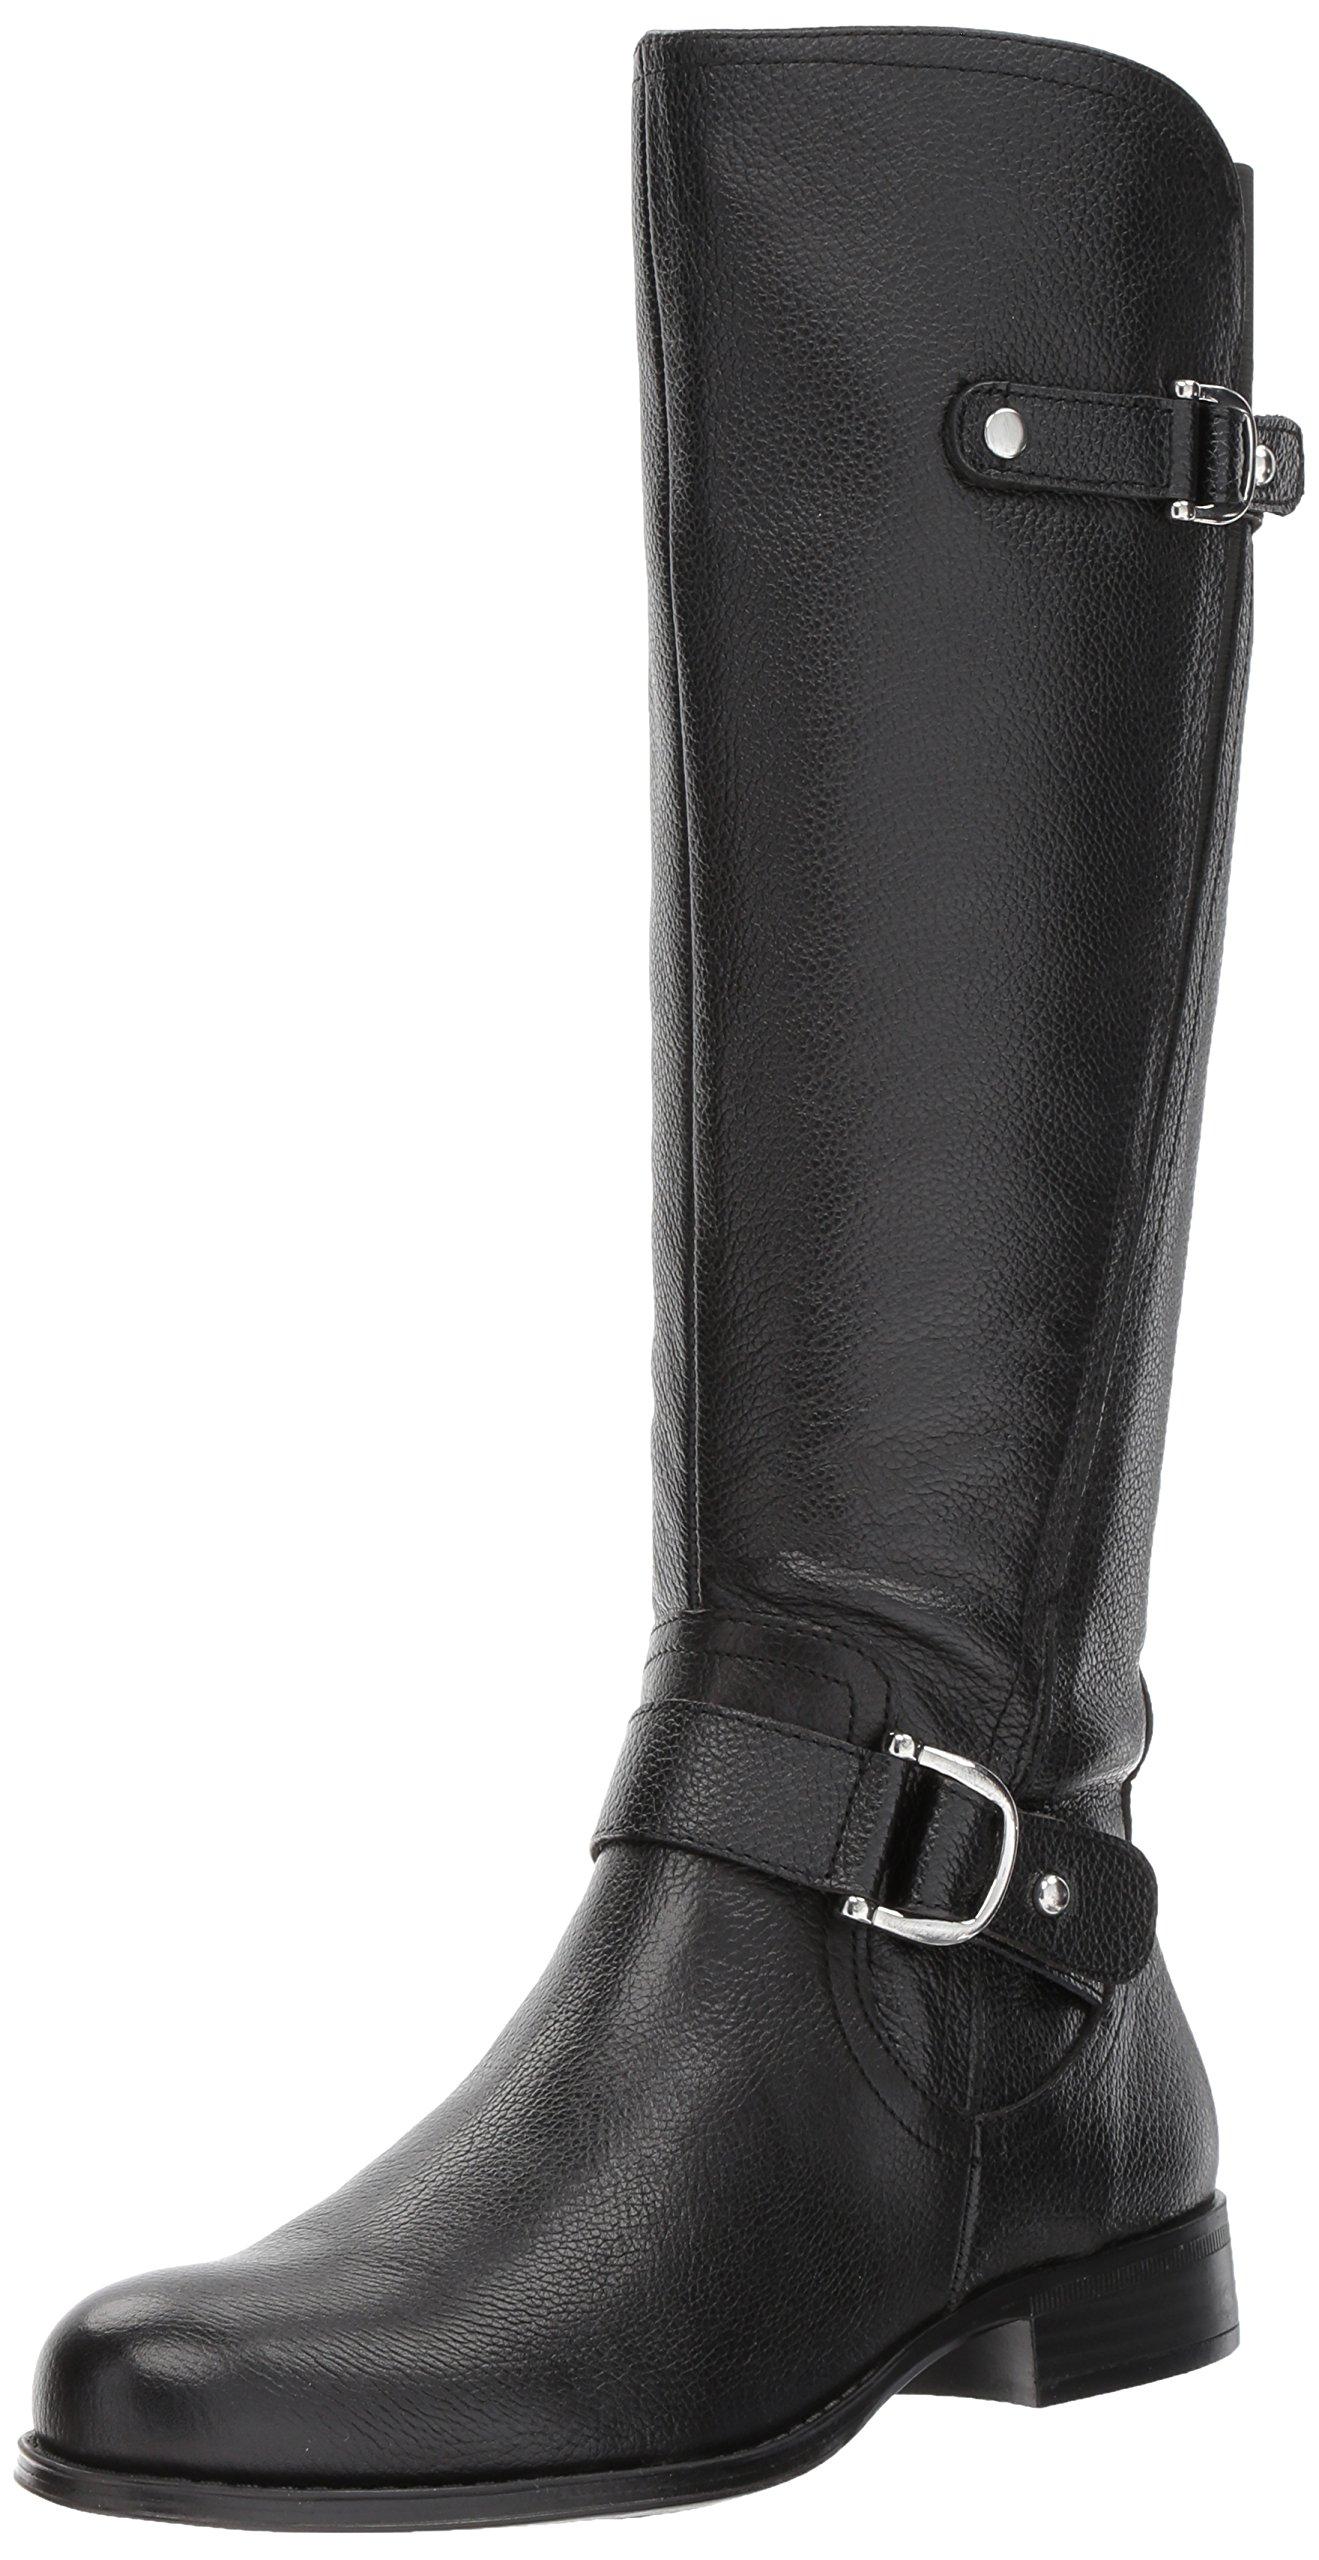 Naturalizer Women's Jenelle Riding Boot, Black, 9.5 W US